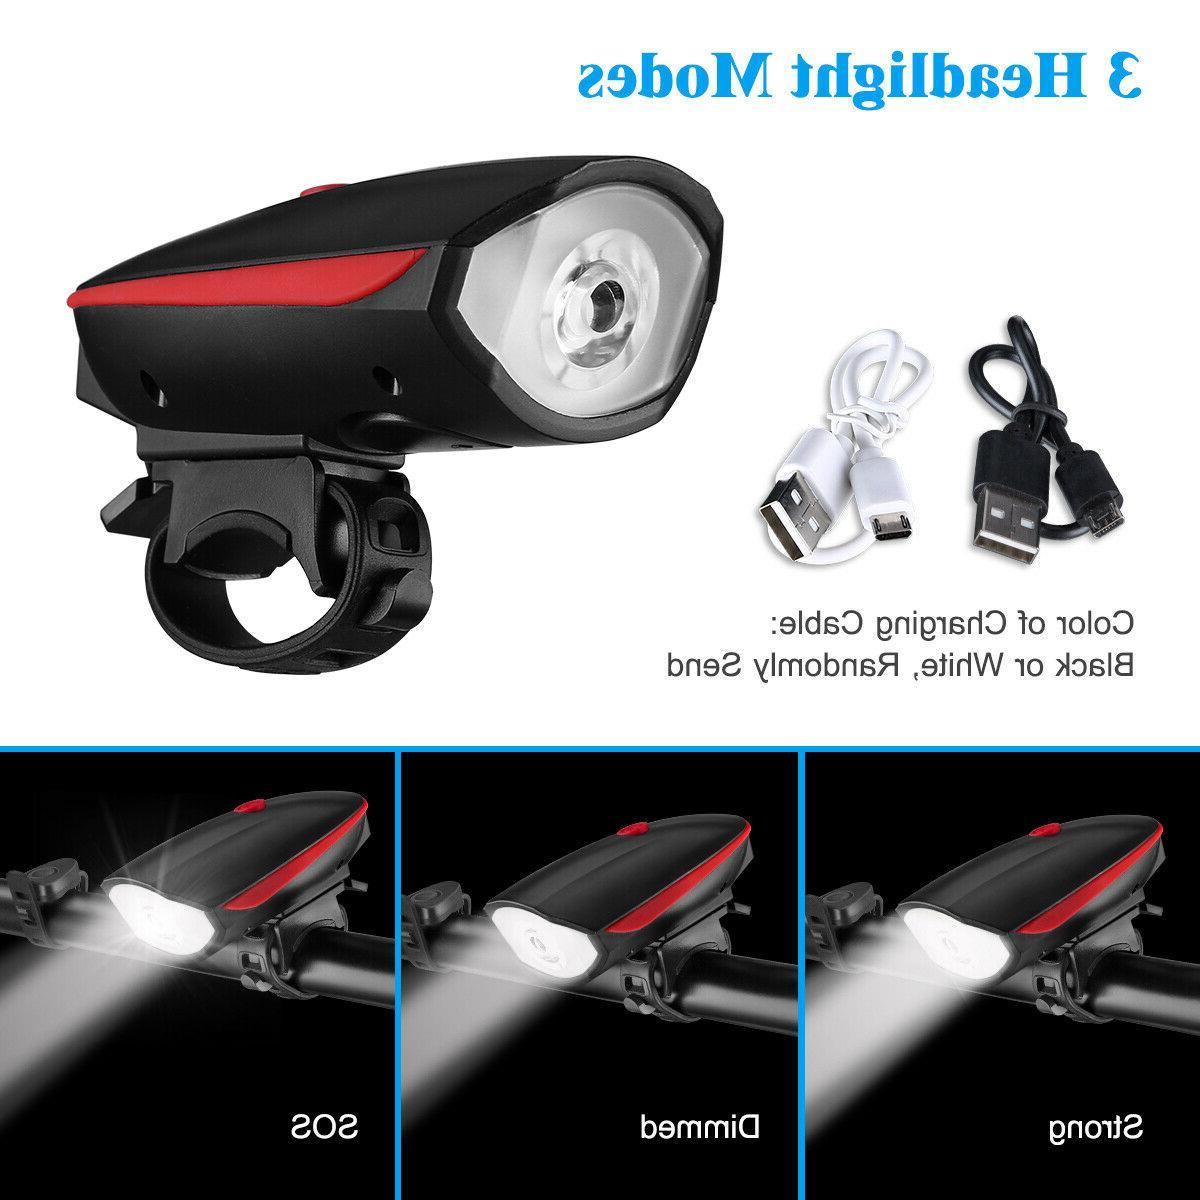 Super USB Led Bike Light Headlight US